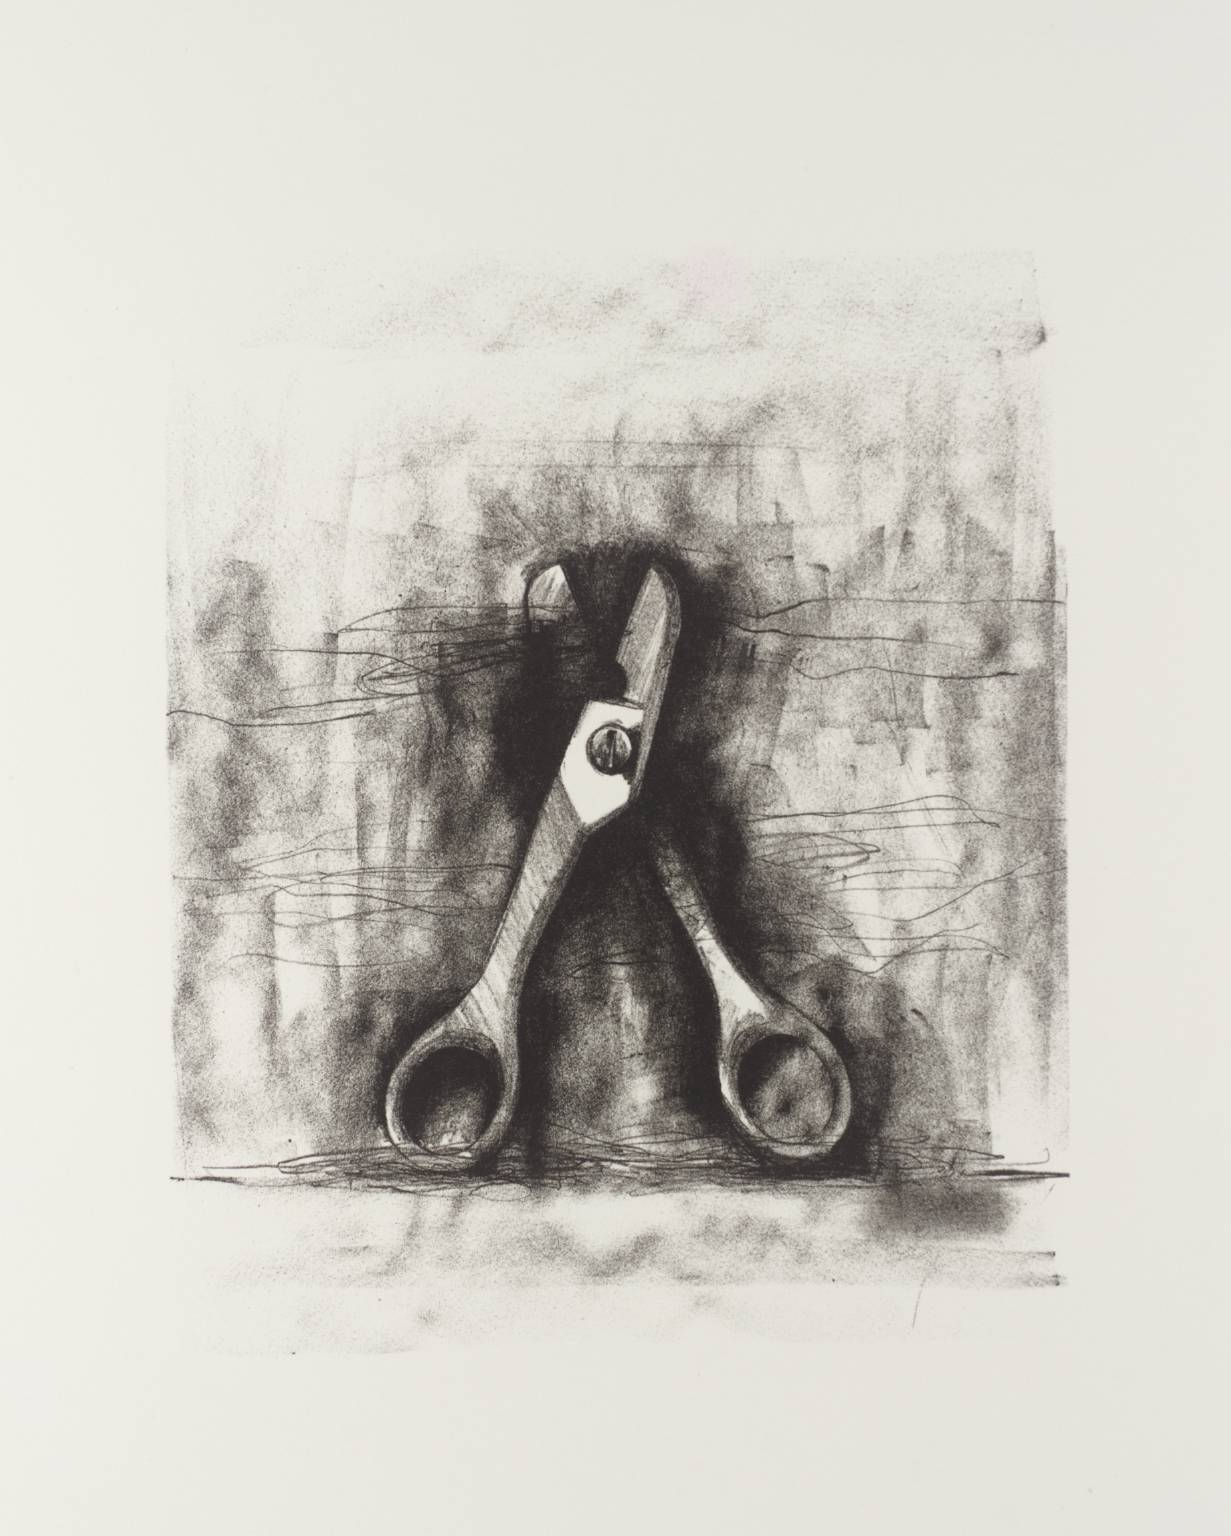 1231x1536 No Title]', Jim Dine, 1973 Tate